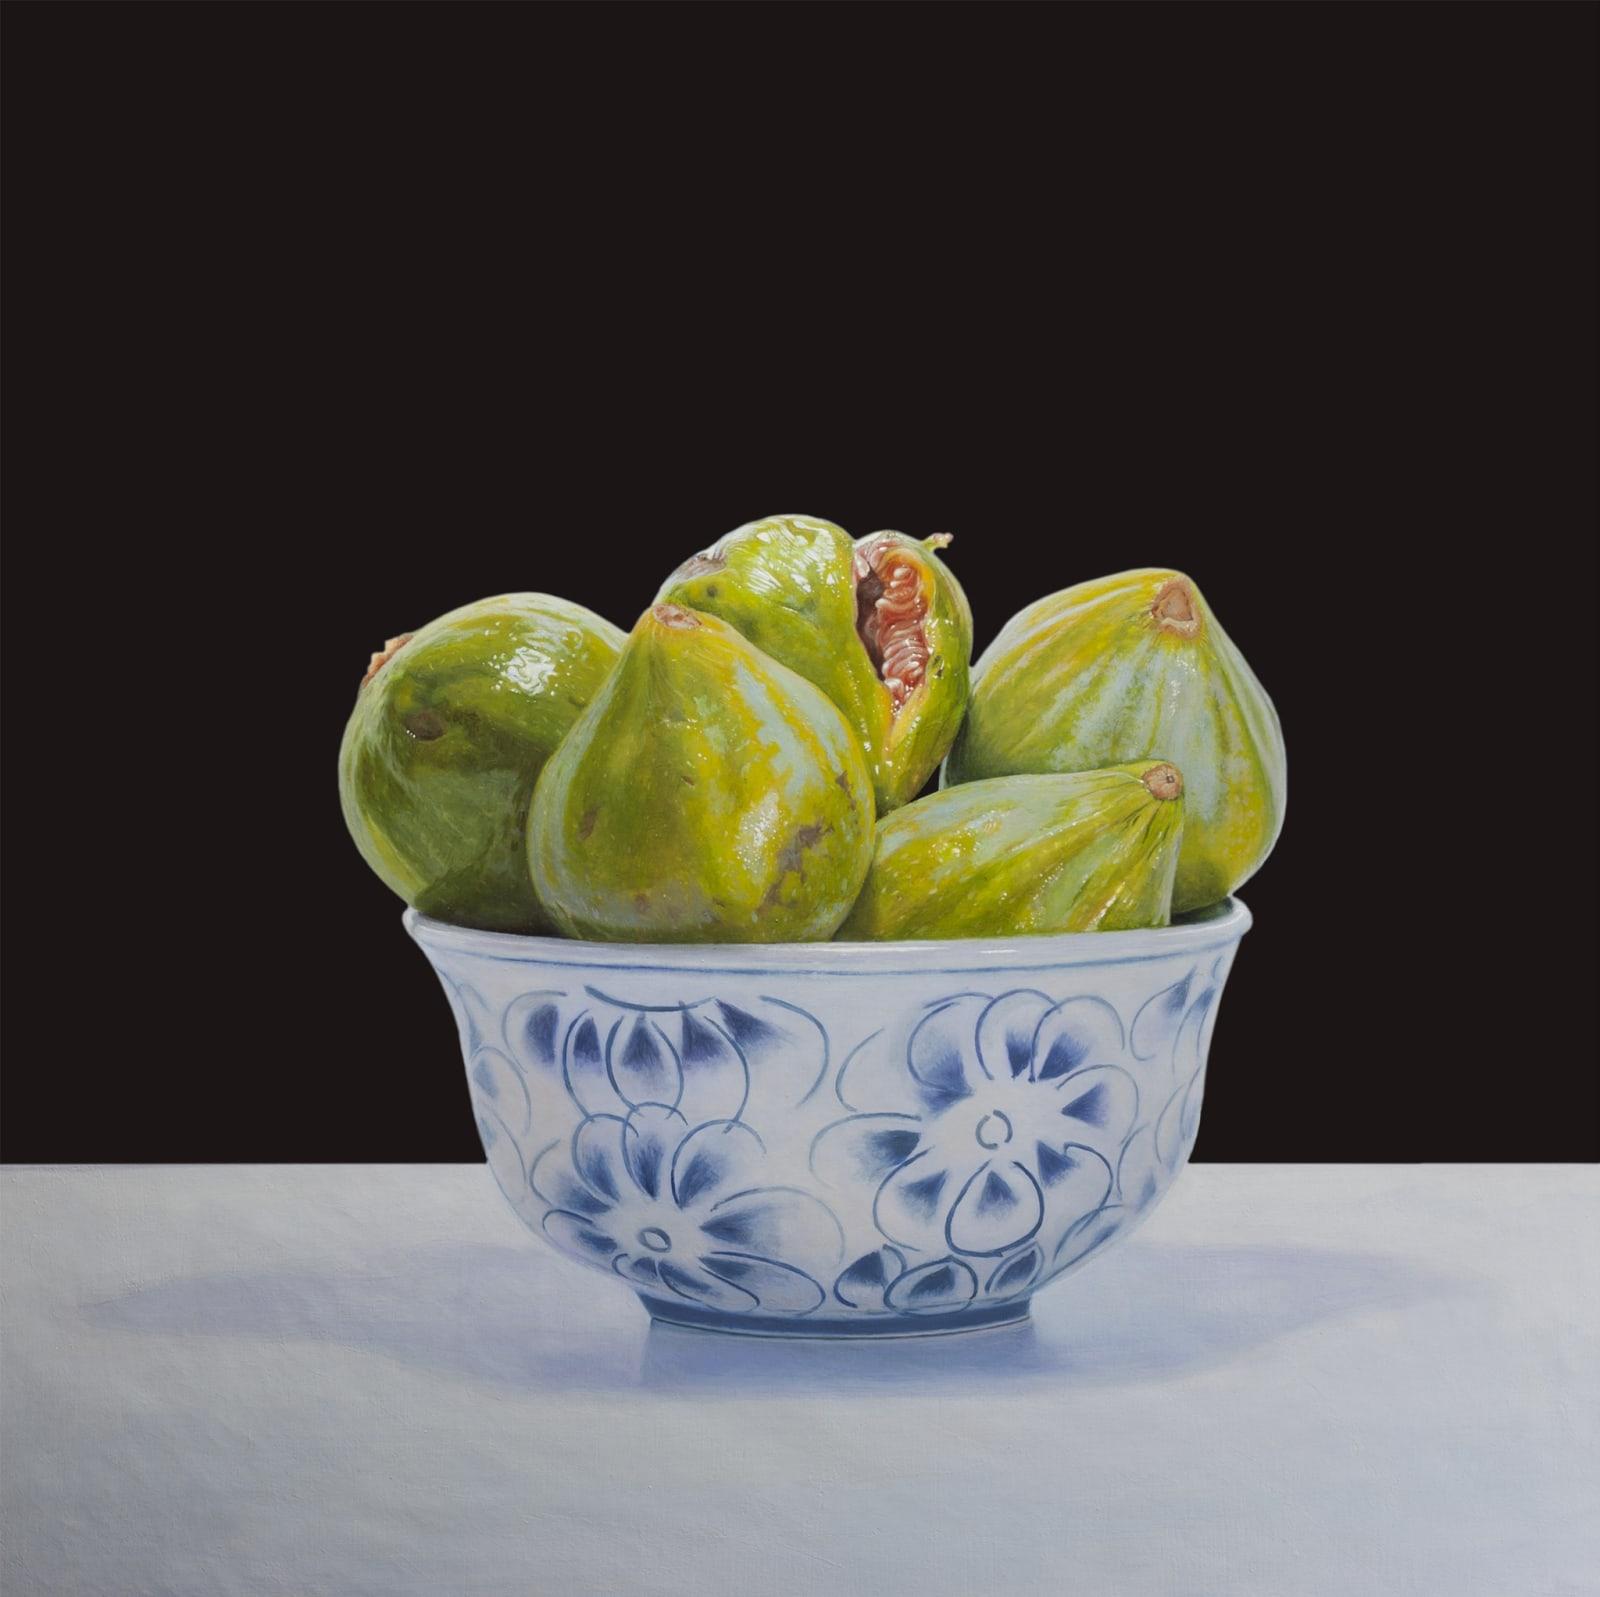 Francesco Stile, Figs